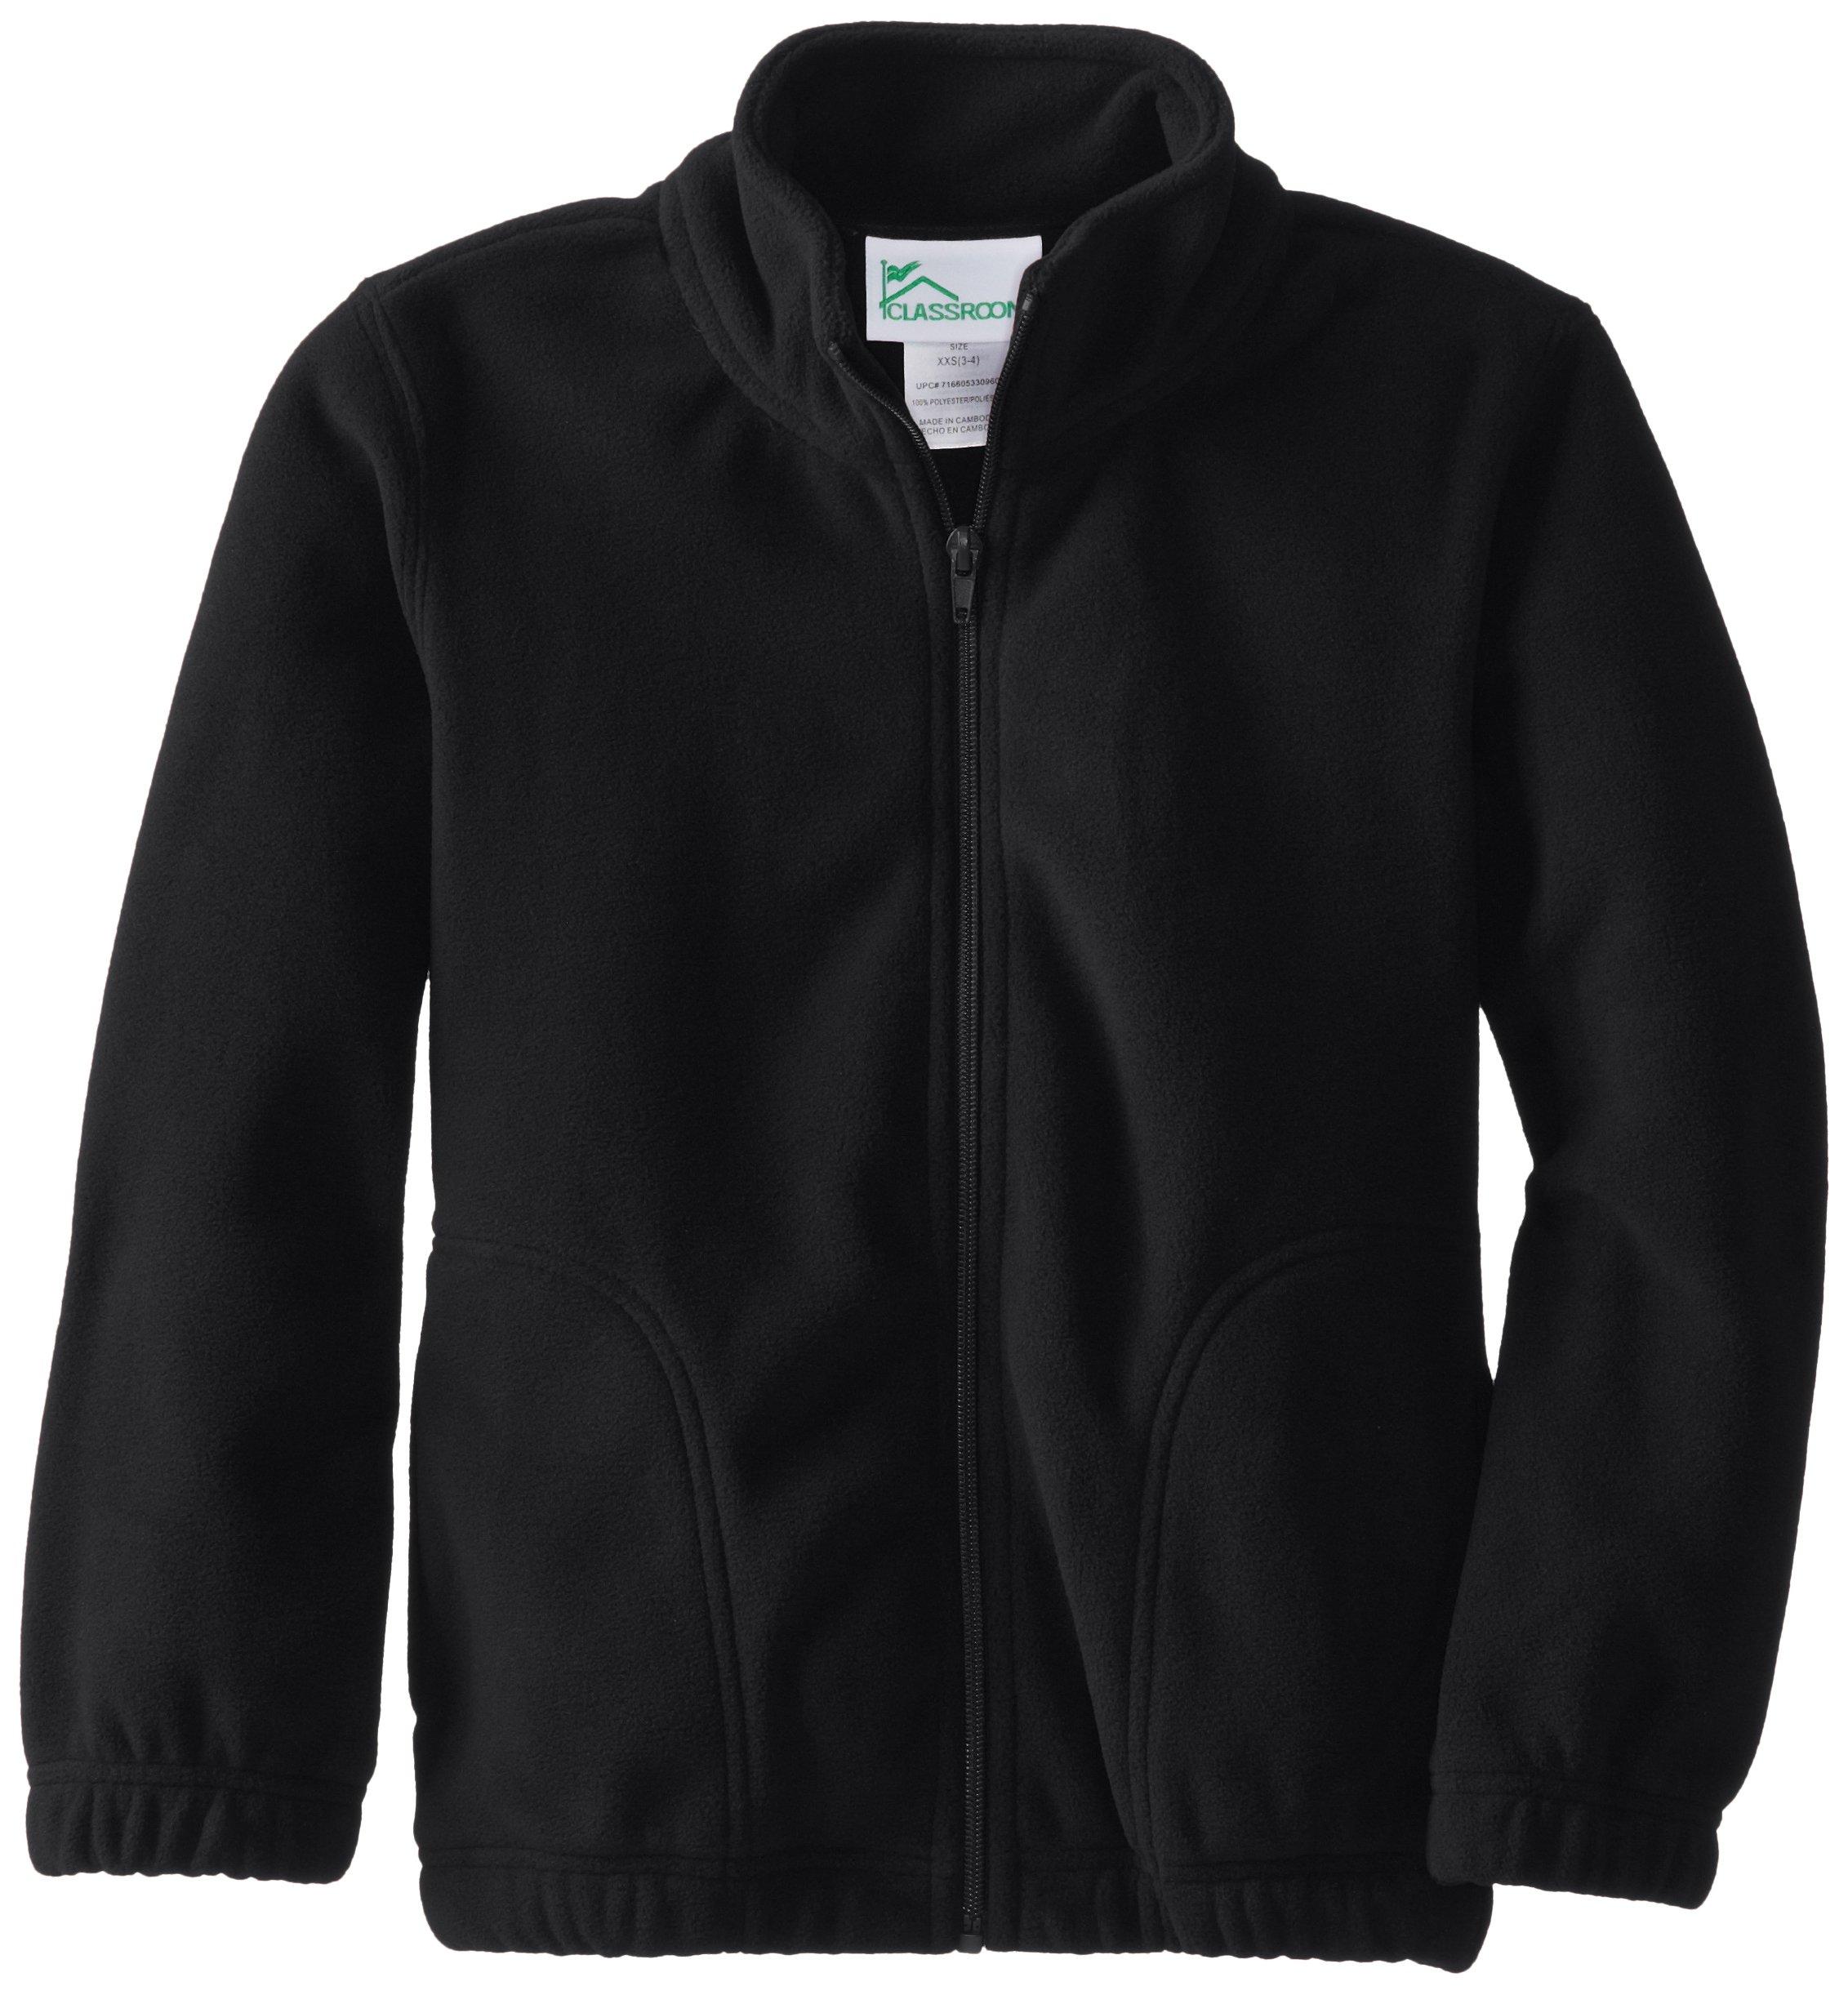 Classroom Uniforms CLASSROOM Youth Unisex Polar Fleece Jacket, Black, Medium by Classroom Uniforms